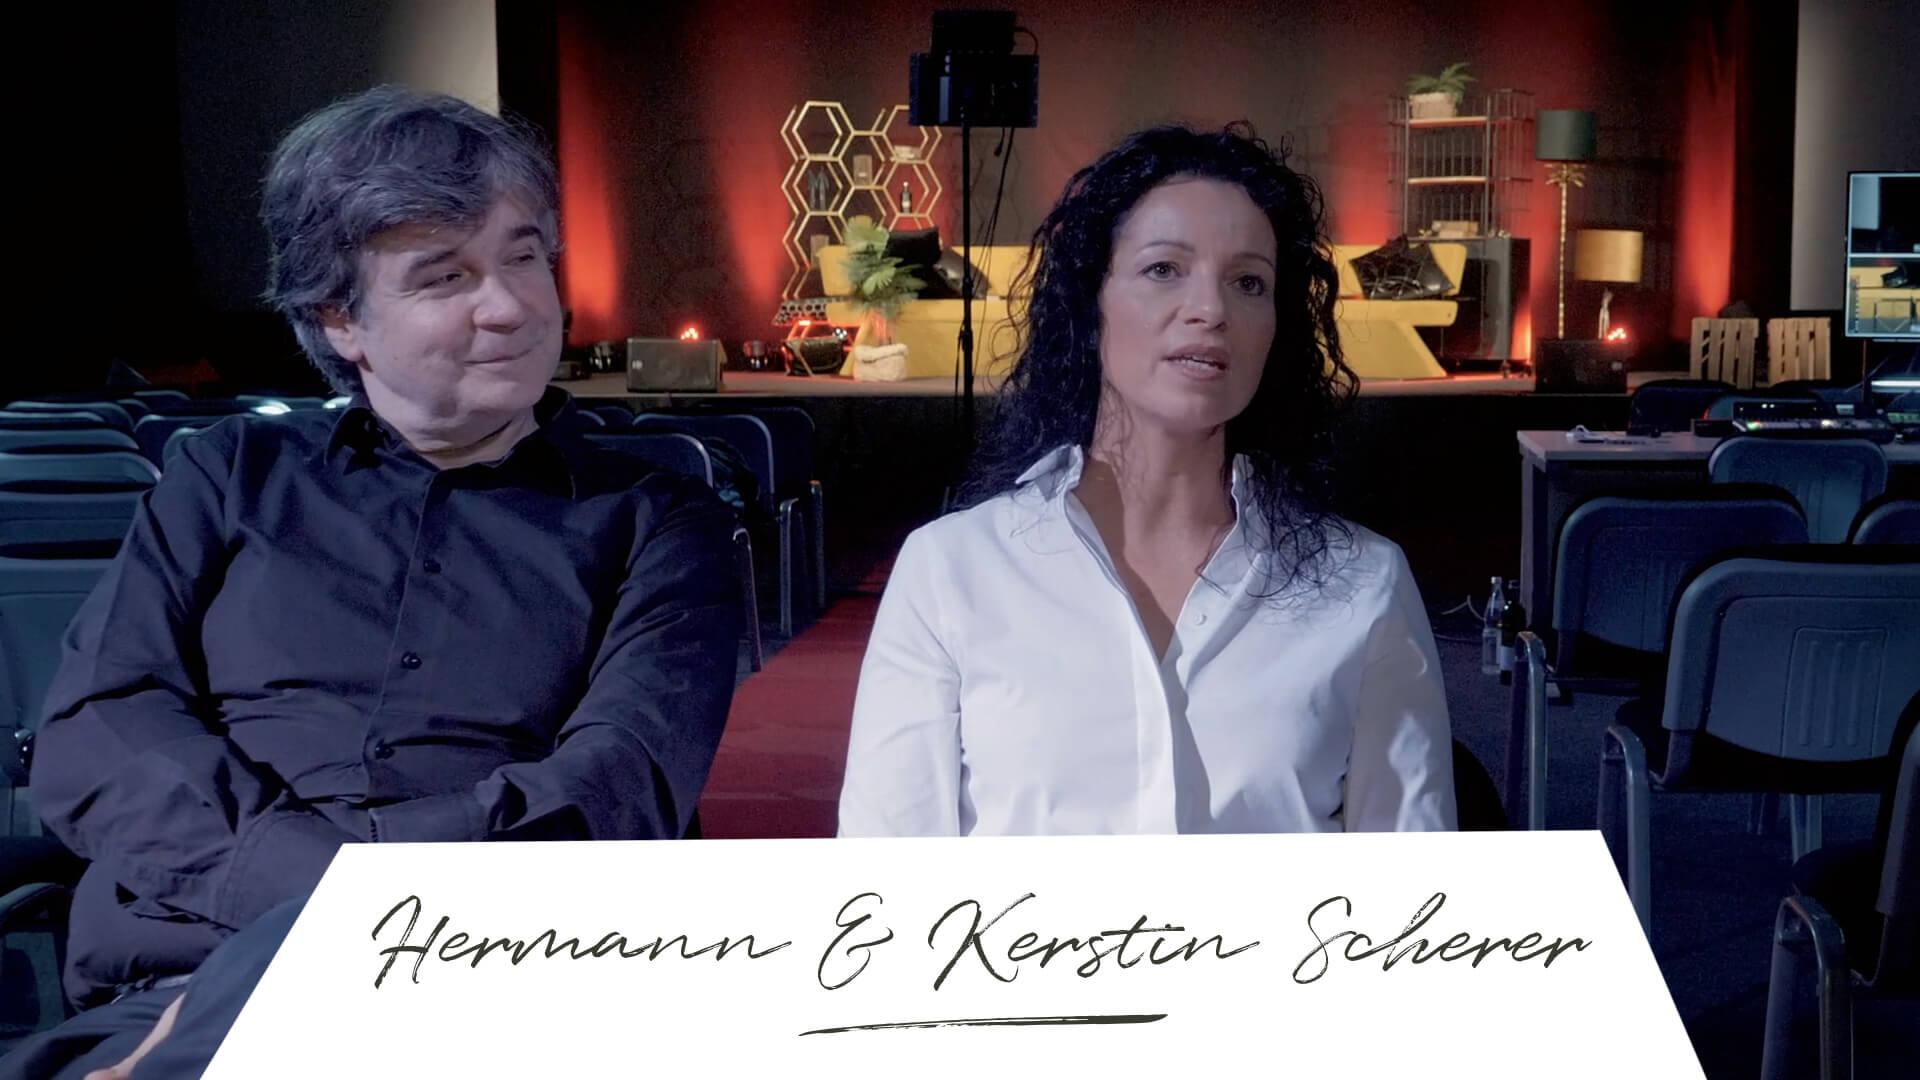 Where is now? Hermann & Kerstin Scherer Wegbegleiter